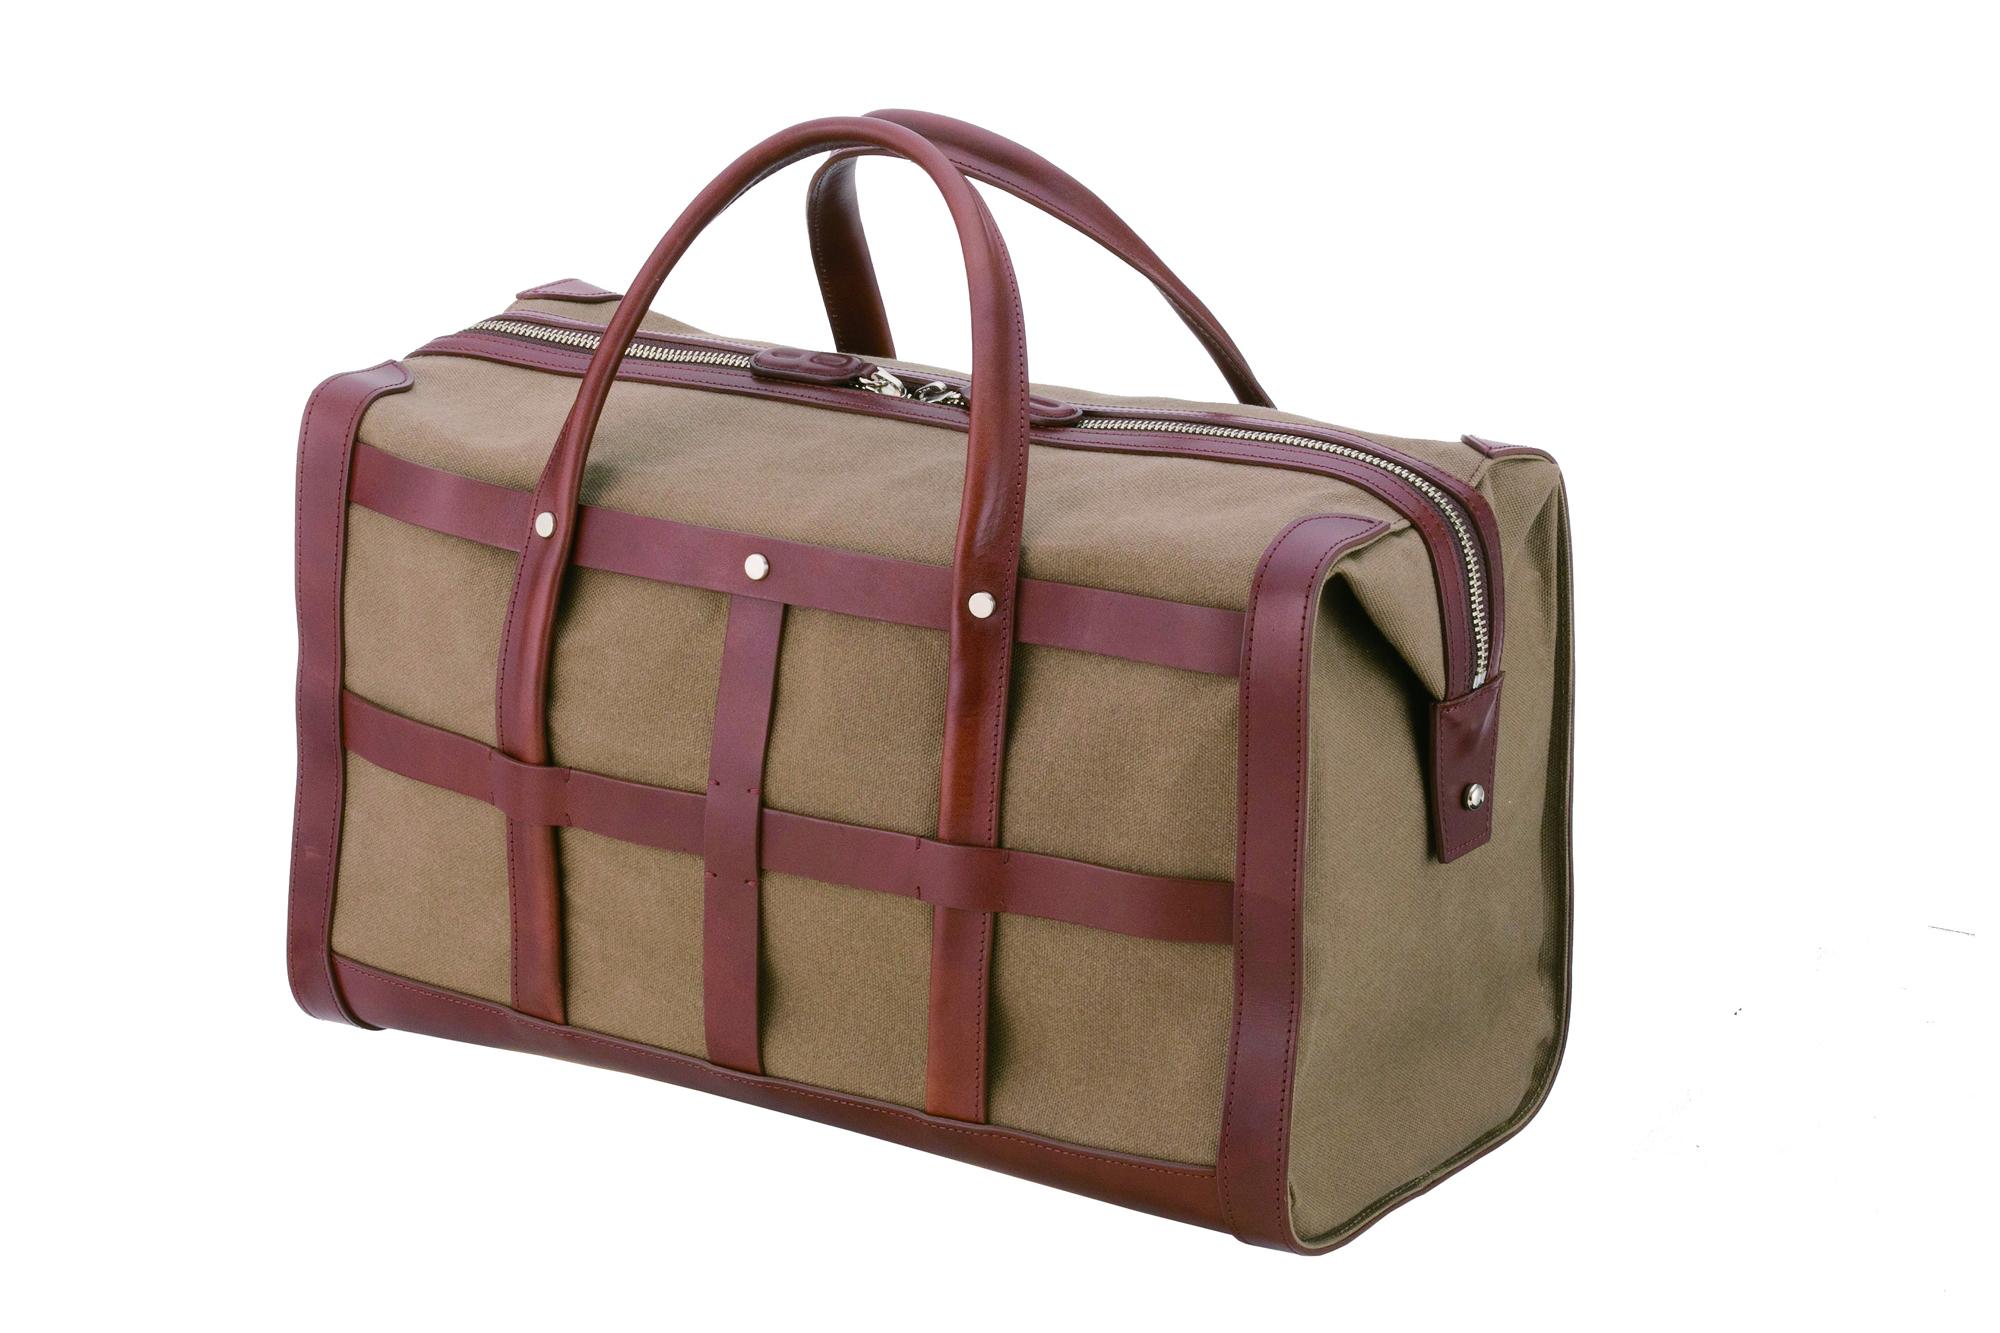 ATM80 1泊2日の旅を演出する大人の男のボストンバッグ。ATMはAtamiから。かつて熱海の新婚旅行に持って行ったような鞄と言う意味。